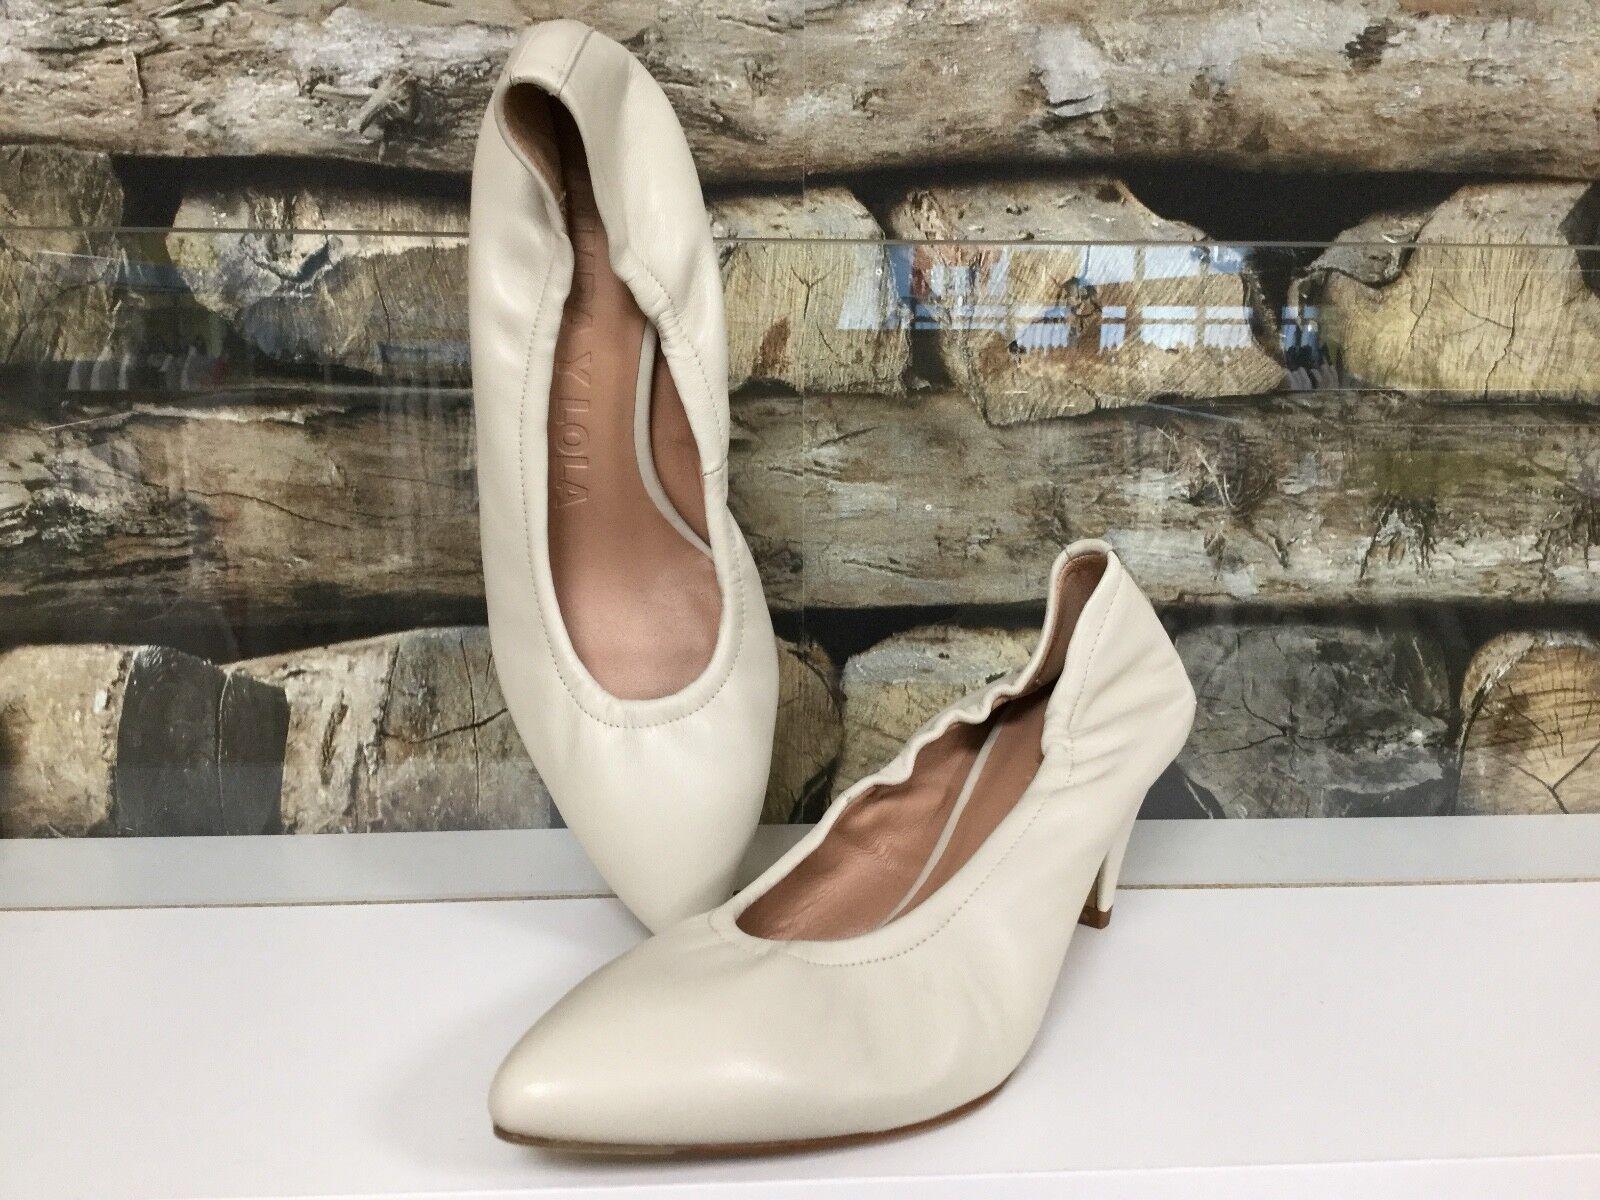 BIMBA Y LOLA Damen Schuhe Damenschuh Pump High Heels Stiletto Weiß Echtleder NEU